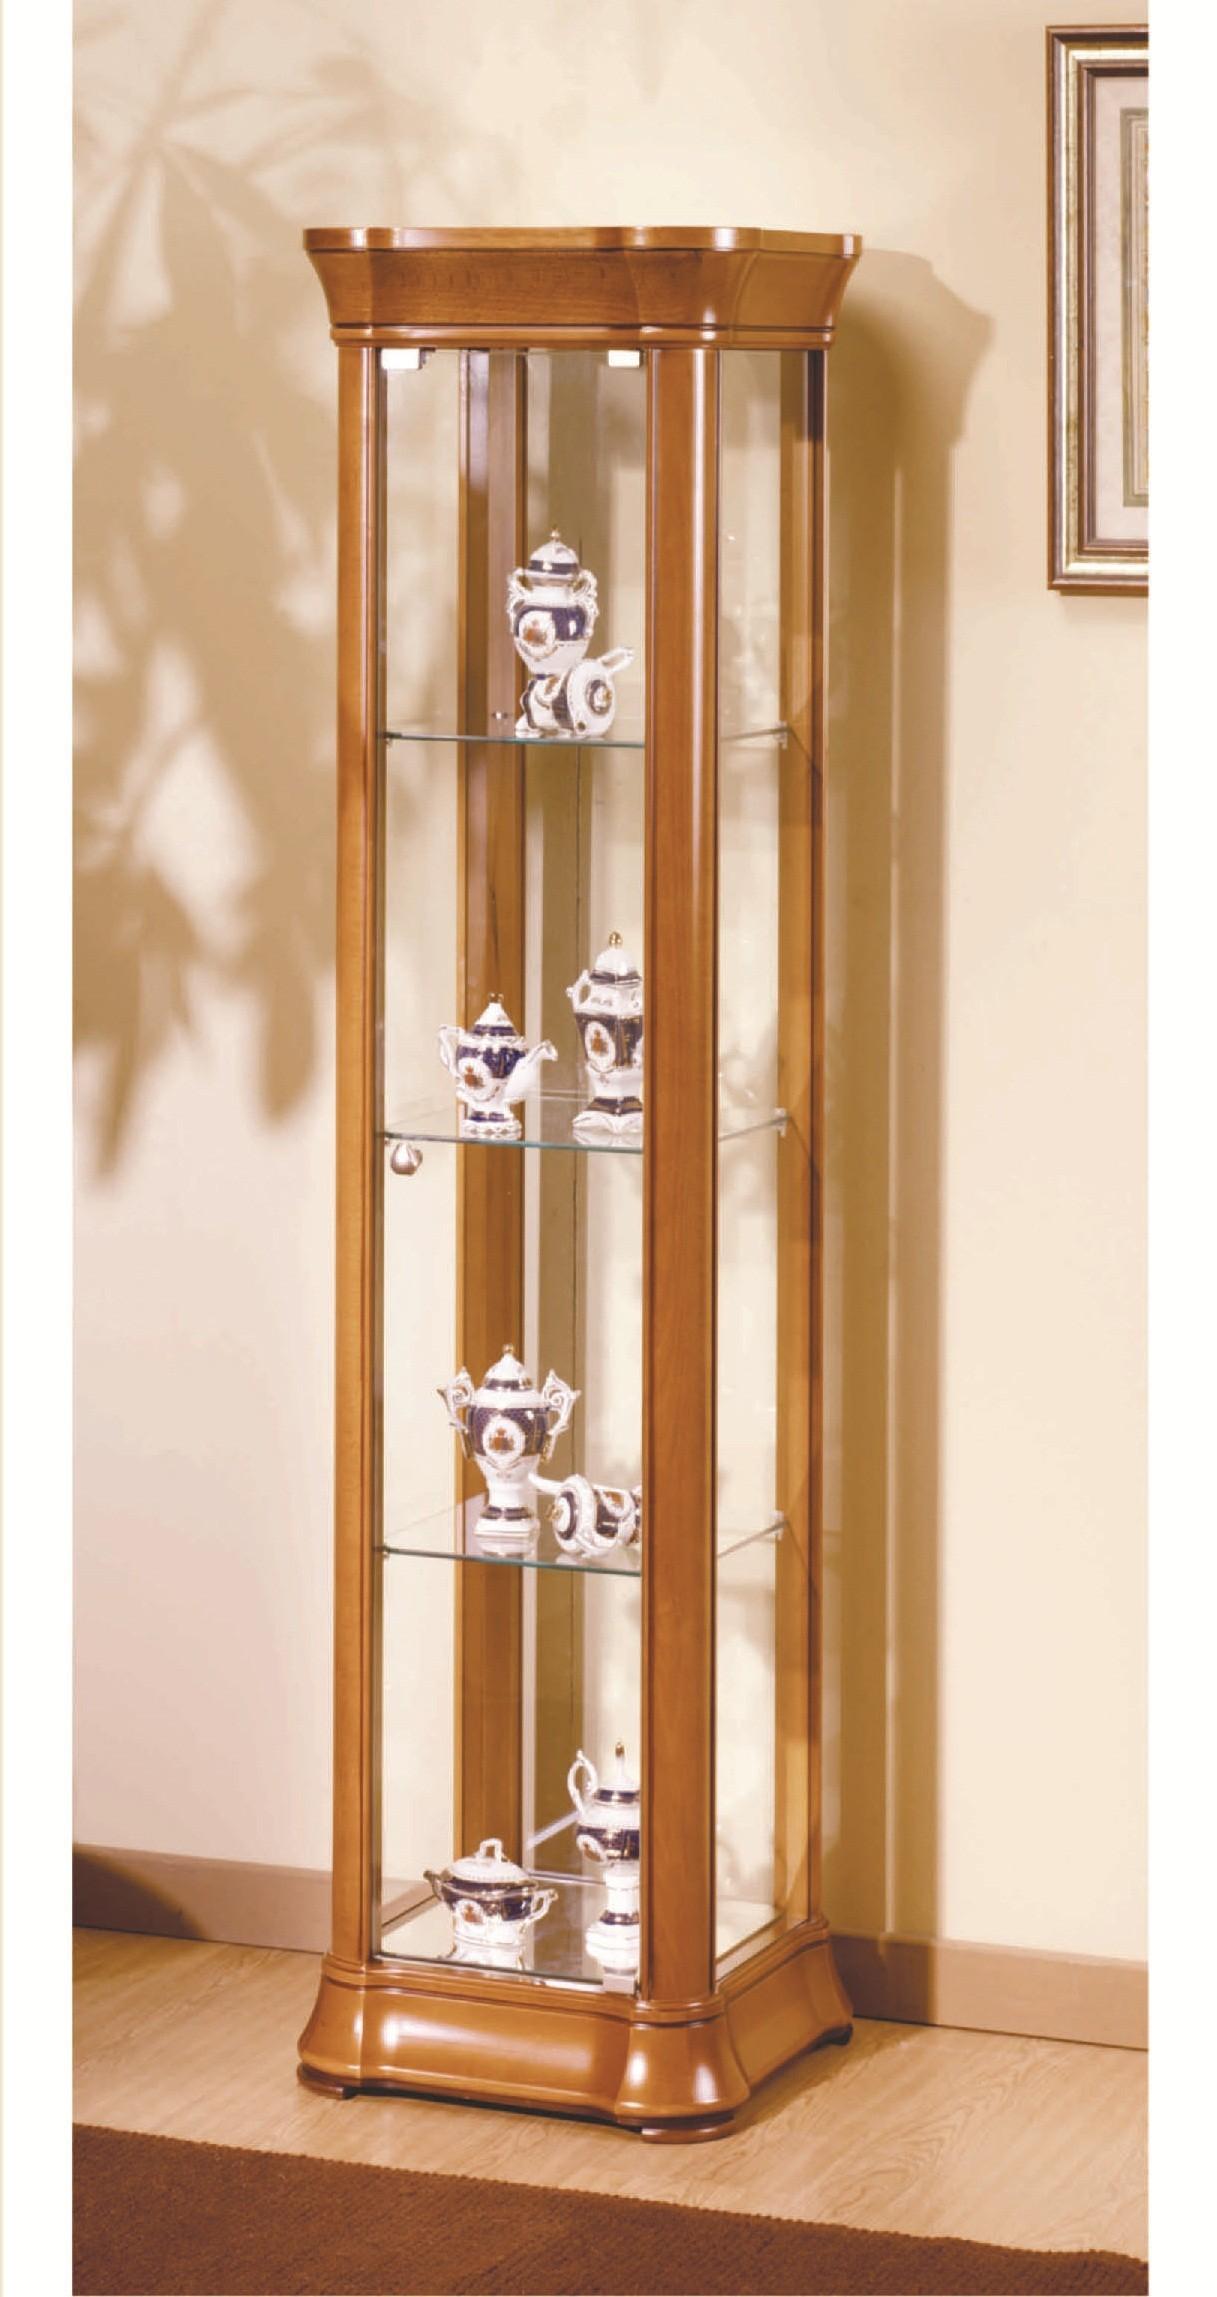 vitrine lux quadrada alta ref 233 438 85. Black Bedroom Furniture Sets. Home Design Ideas